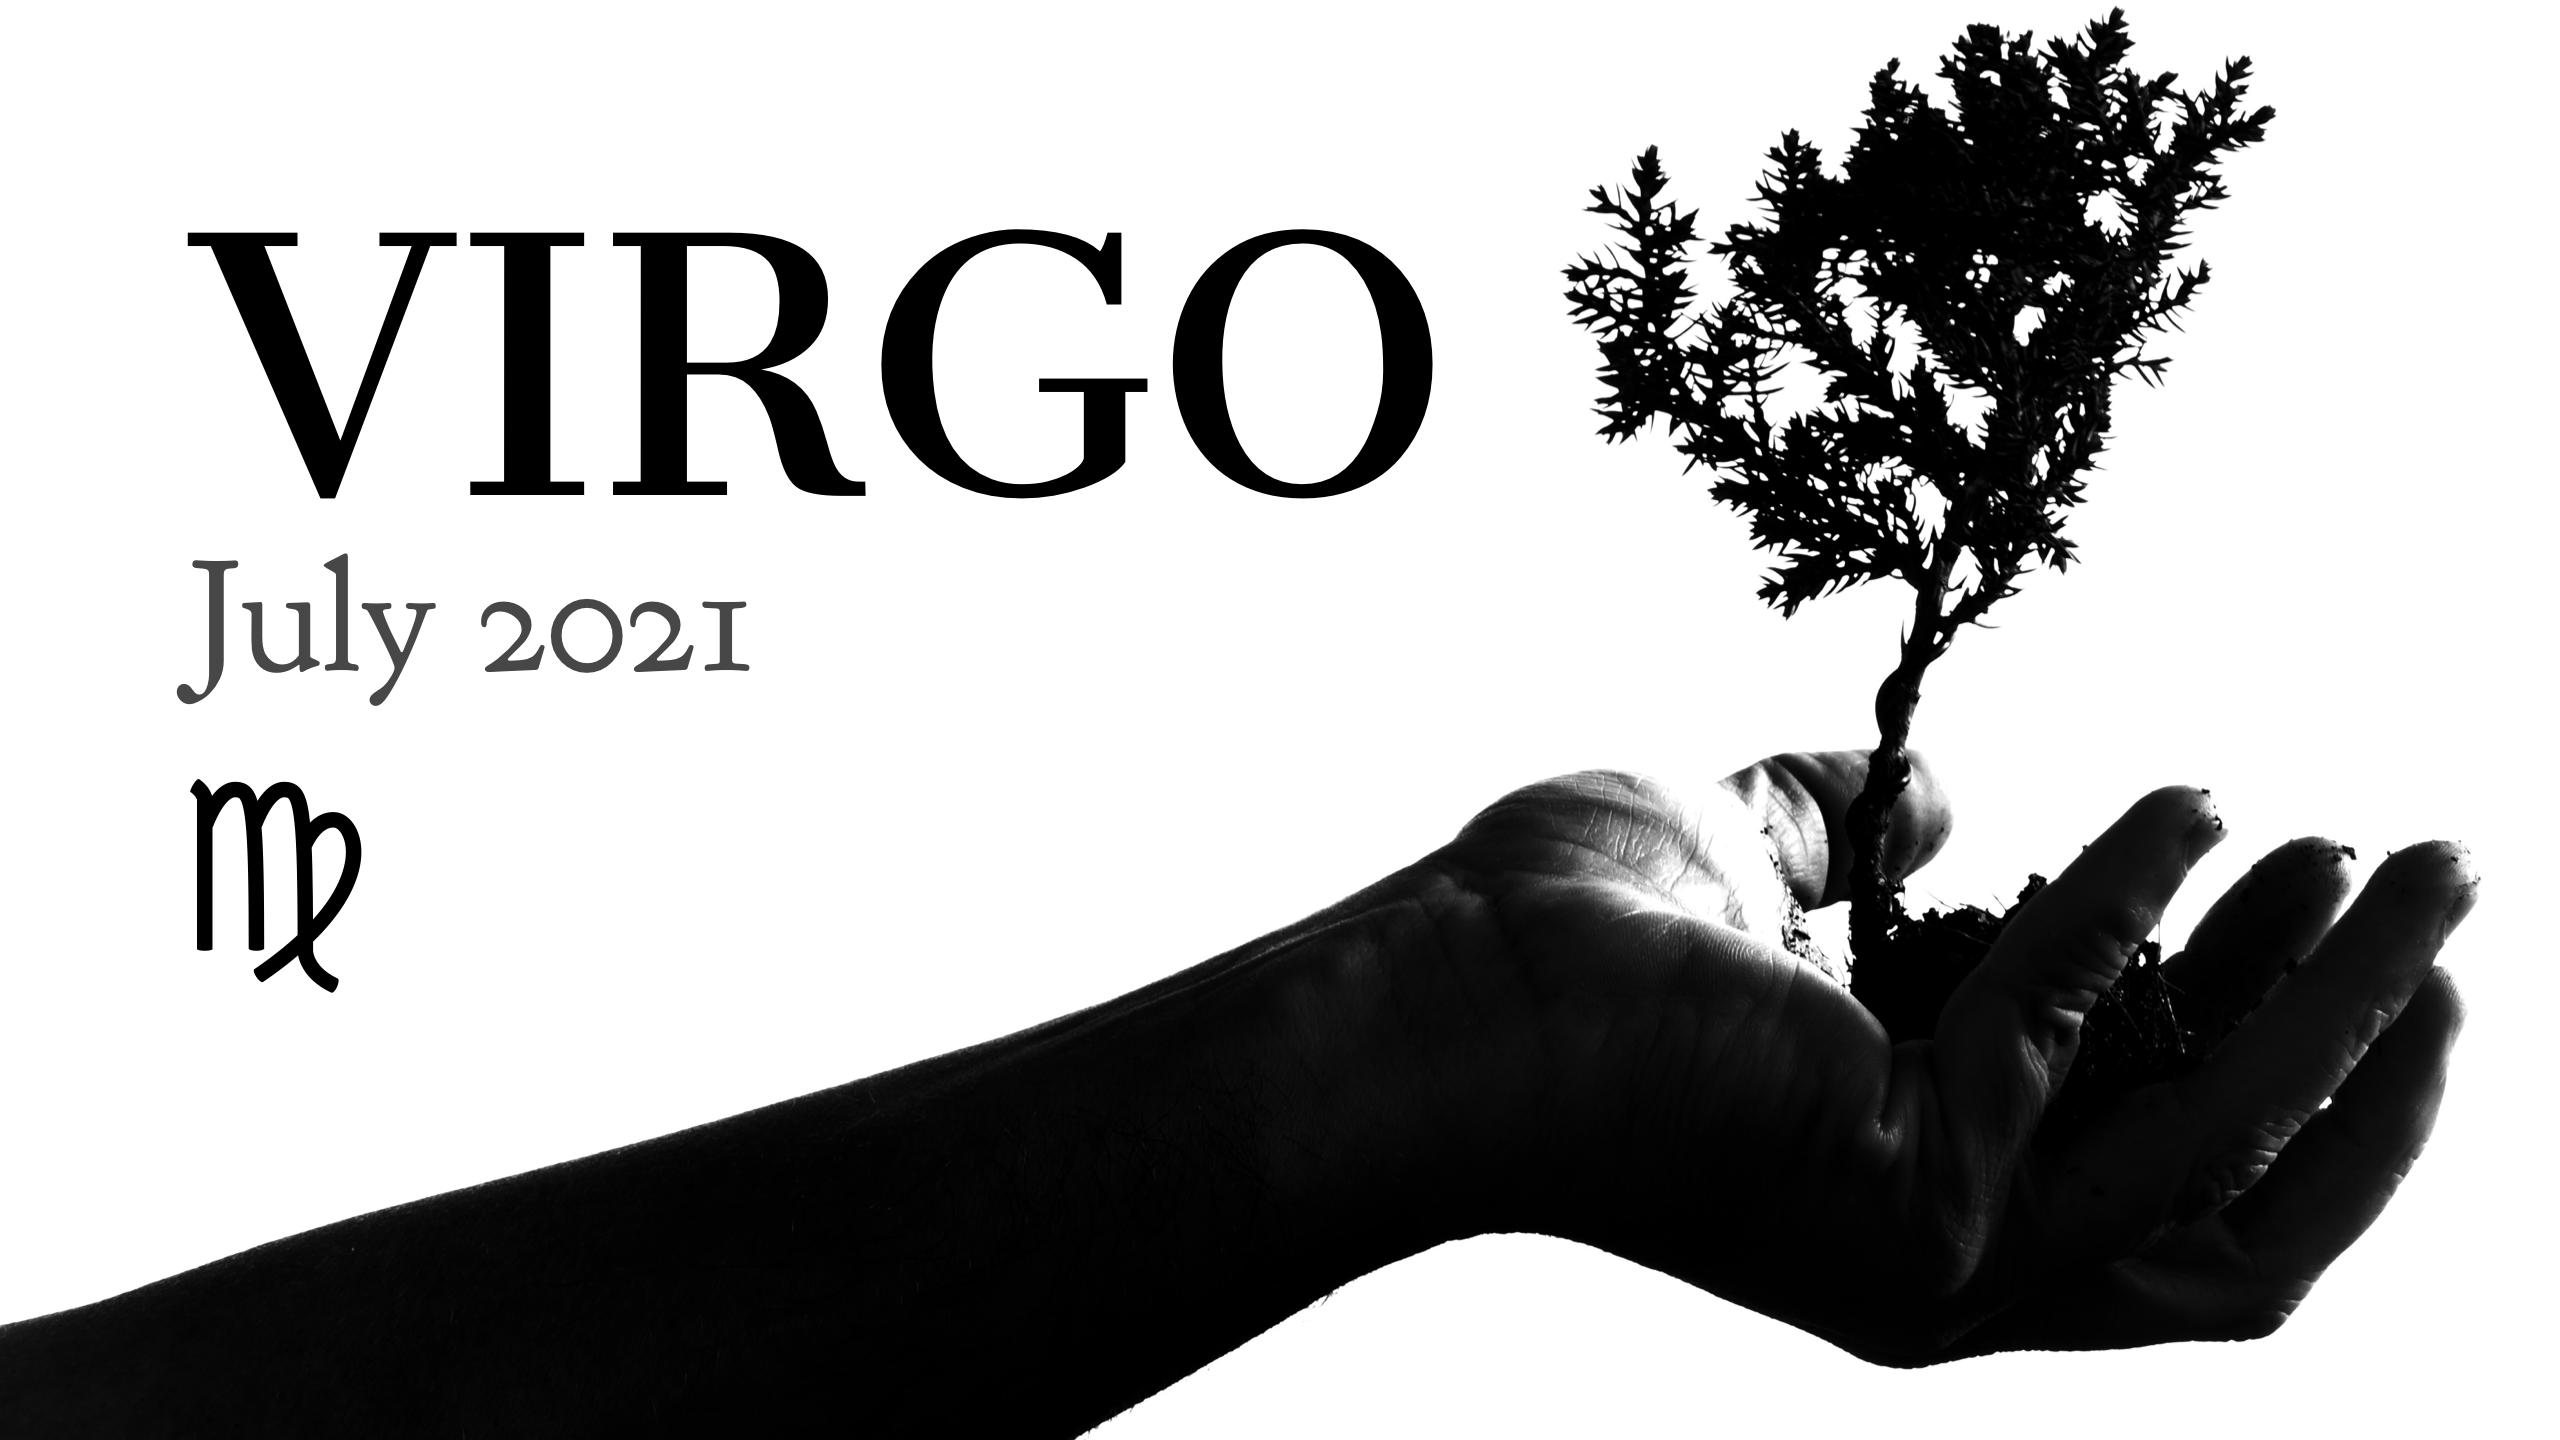 2021 07:Banner:06 Virgo